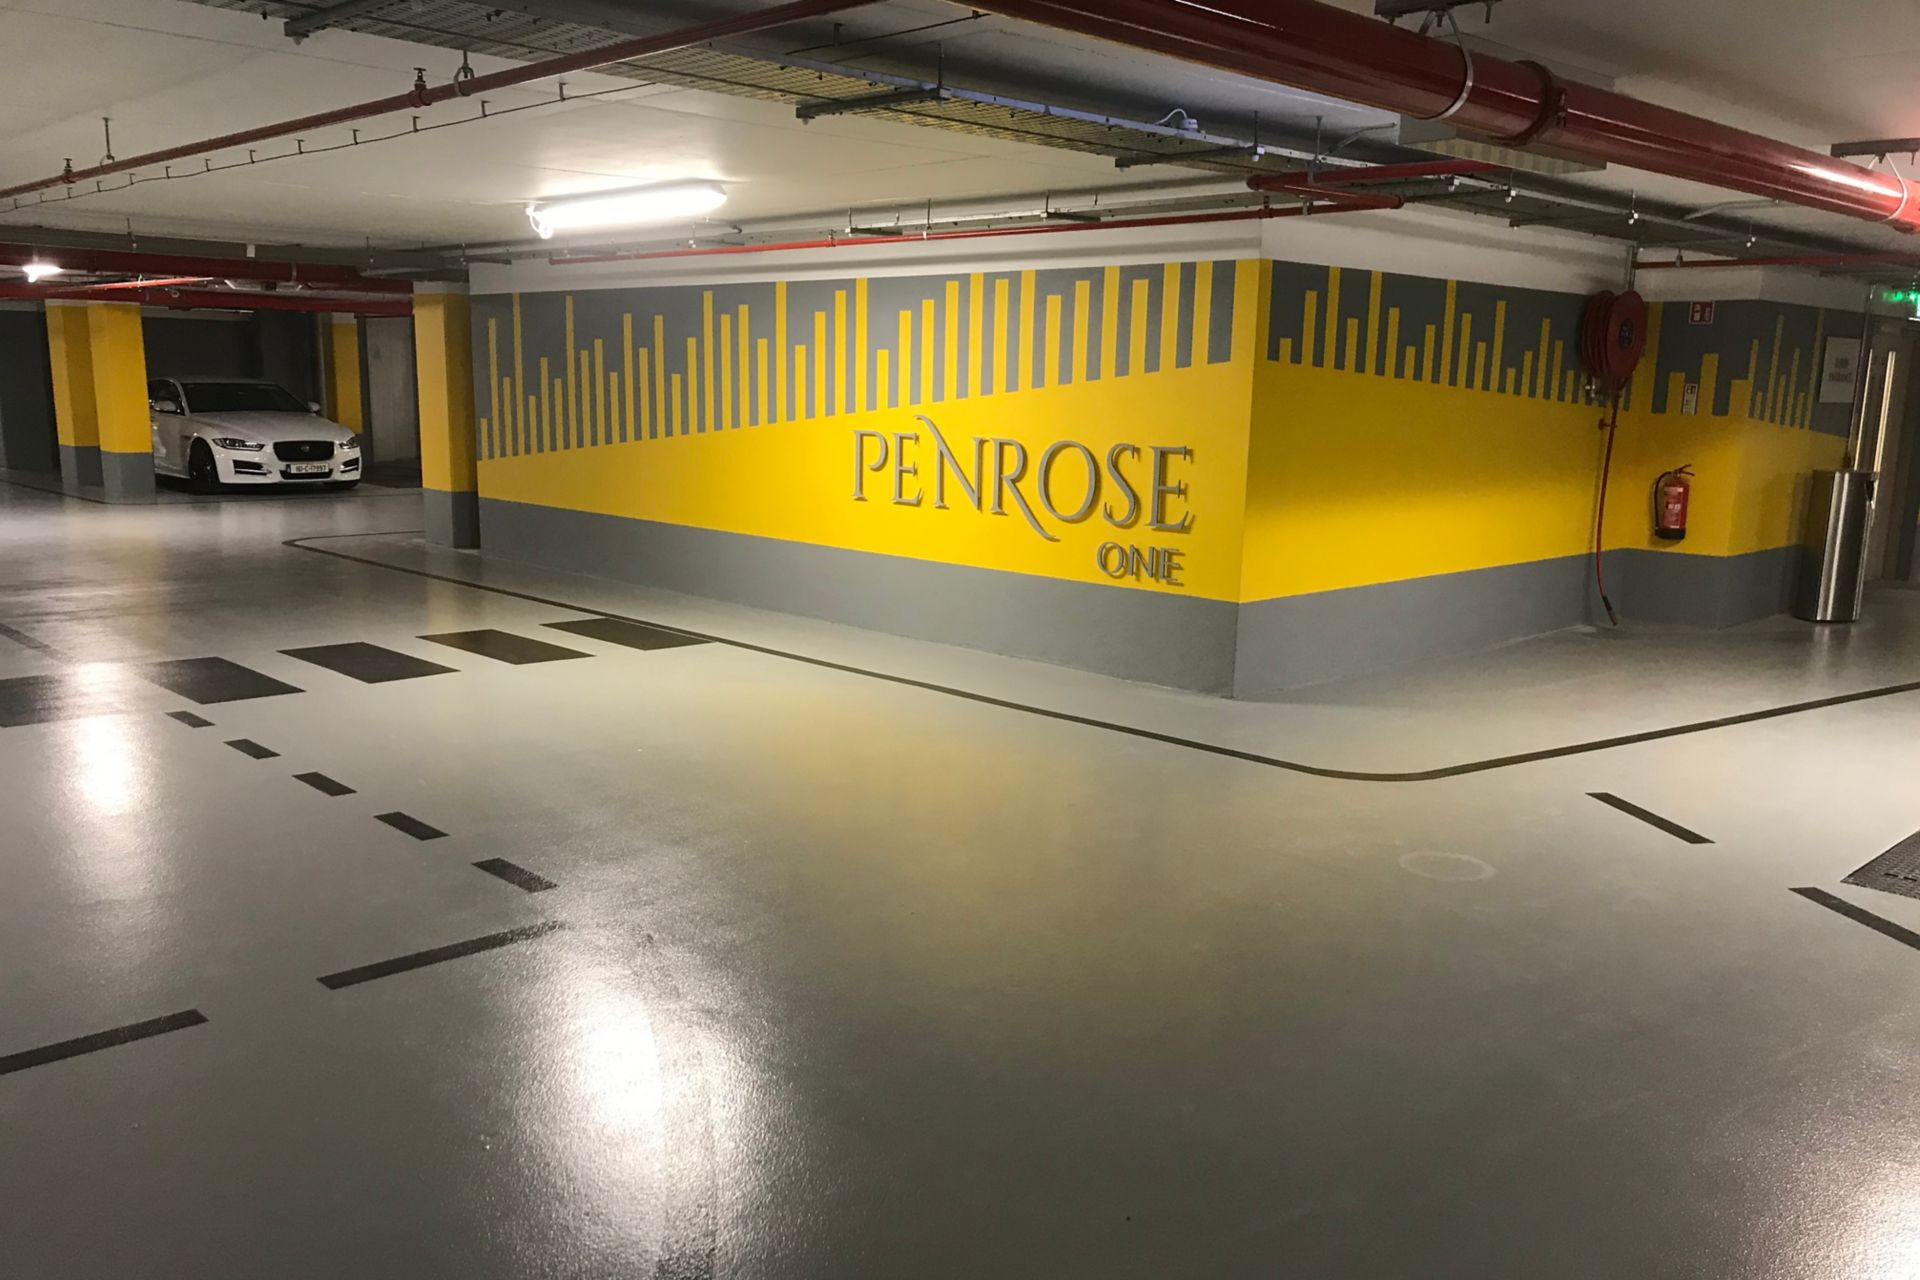 Penrose Quay